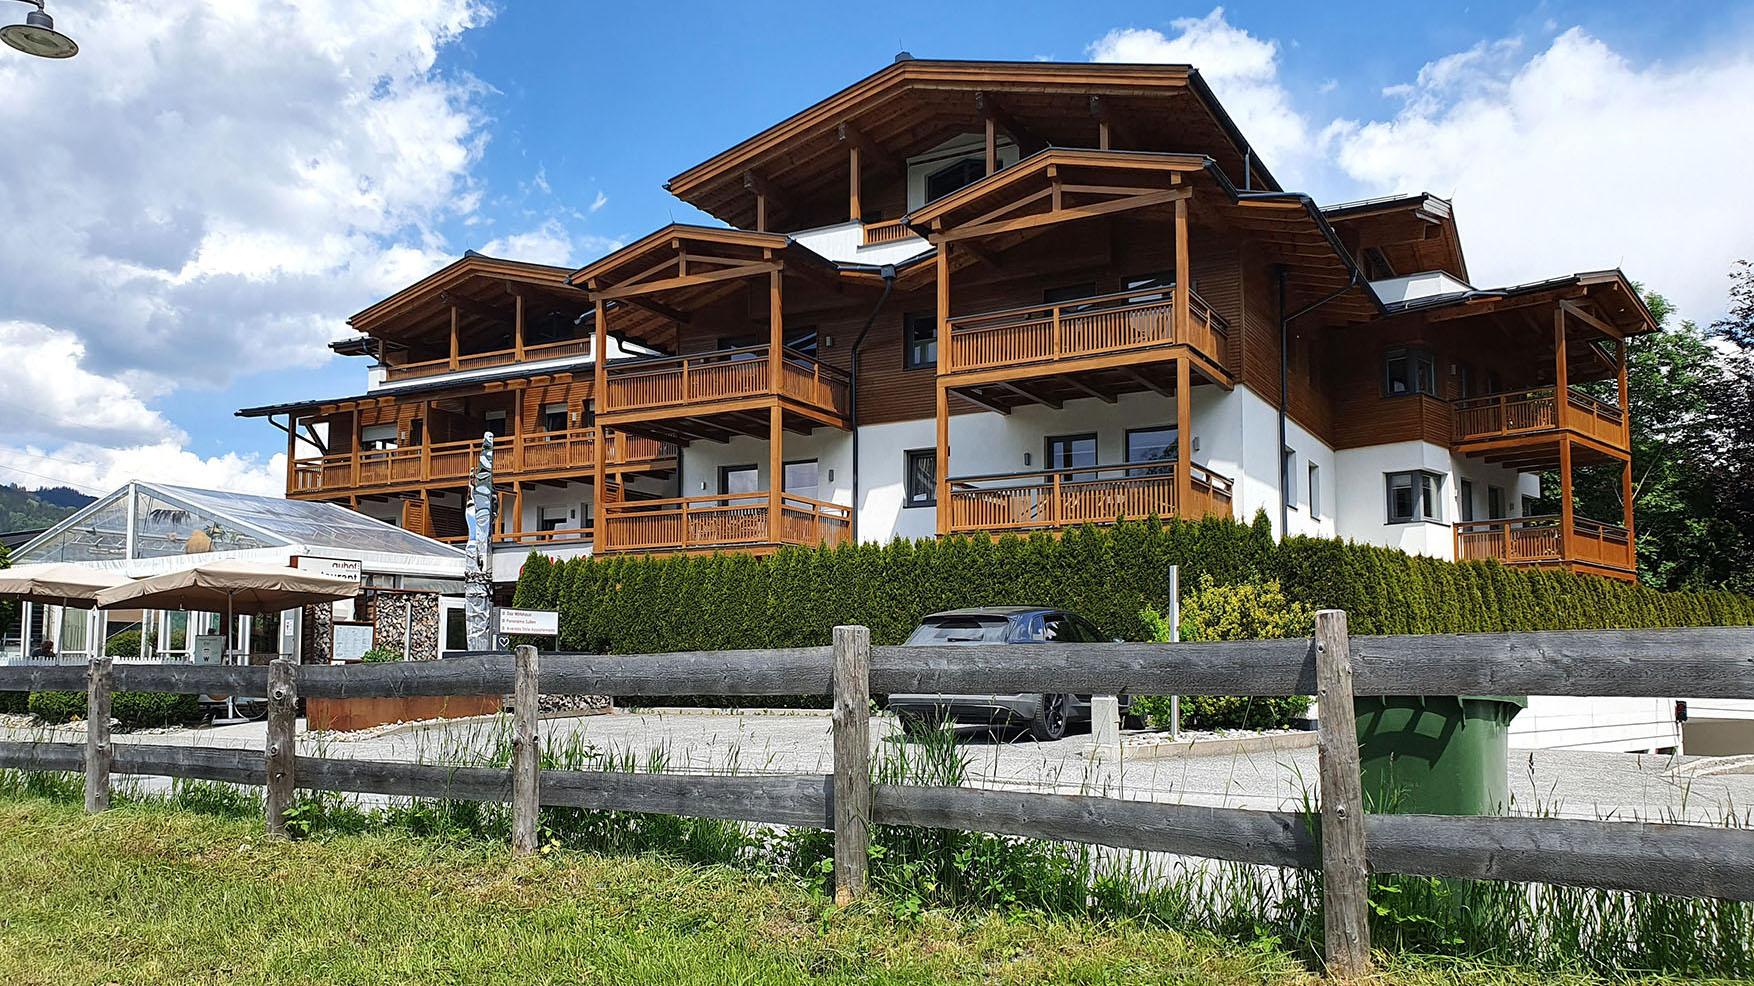 The Kaprun Apartment Apartments, Austria